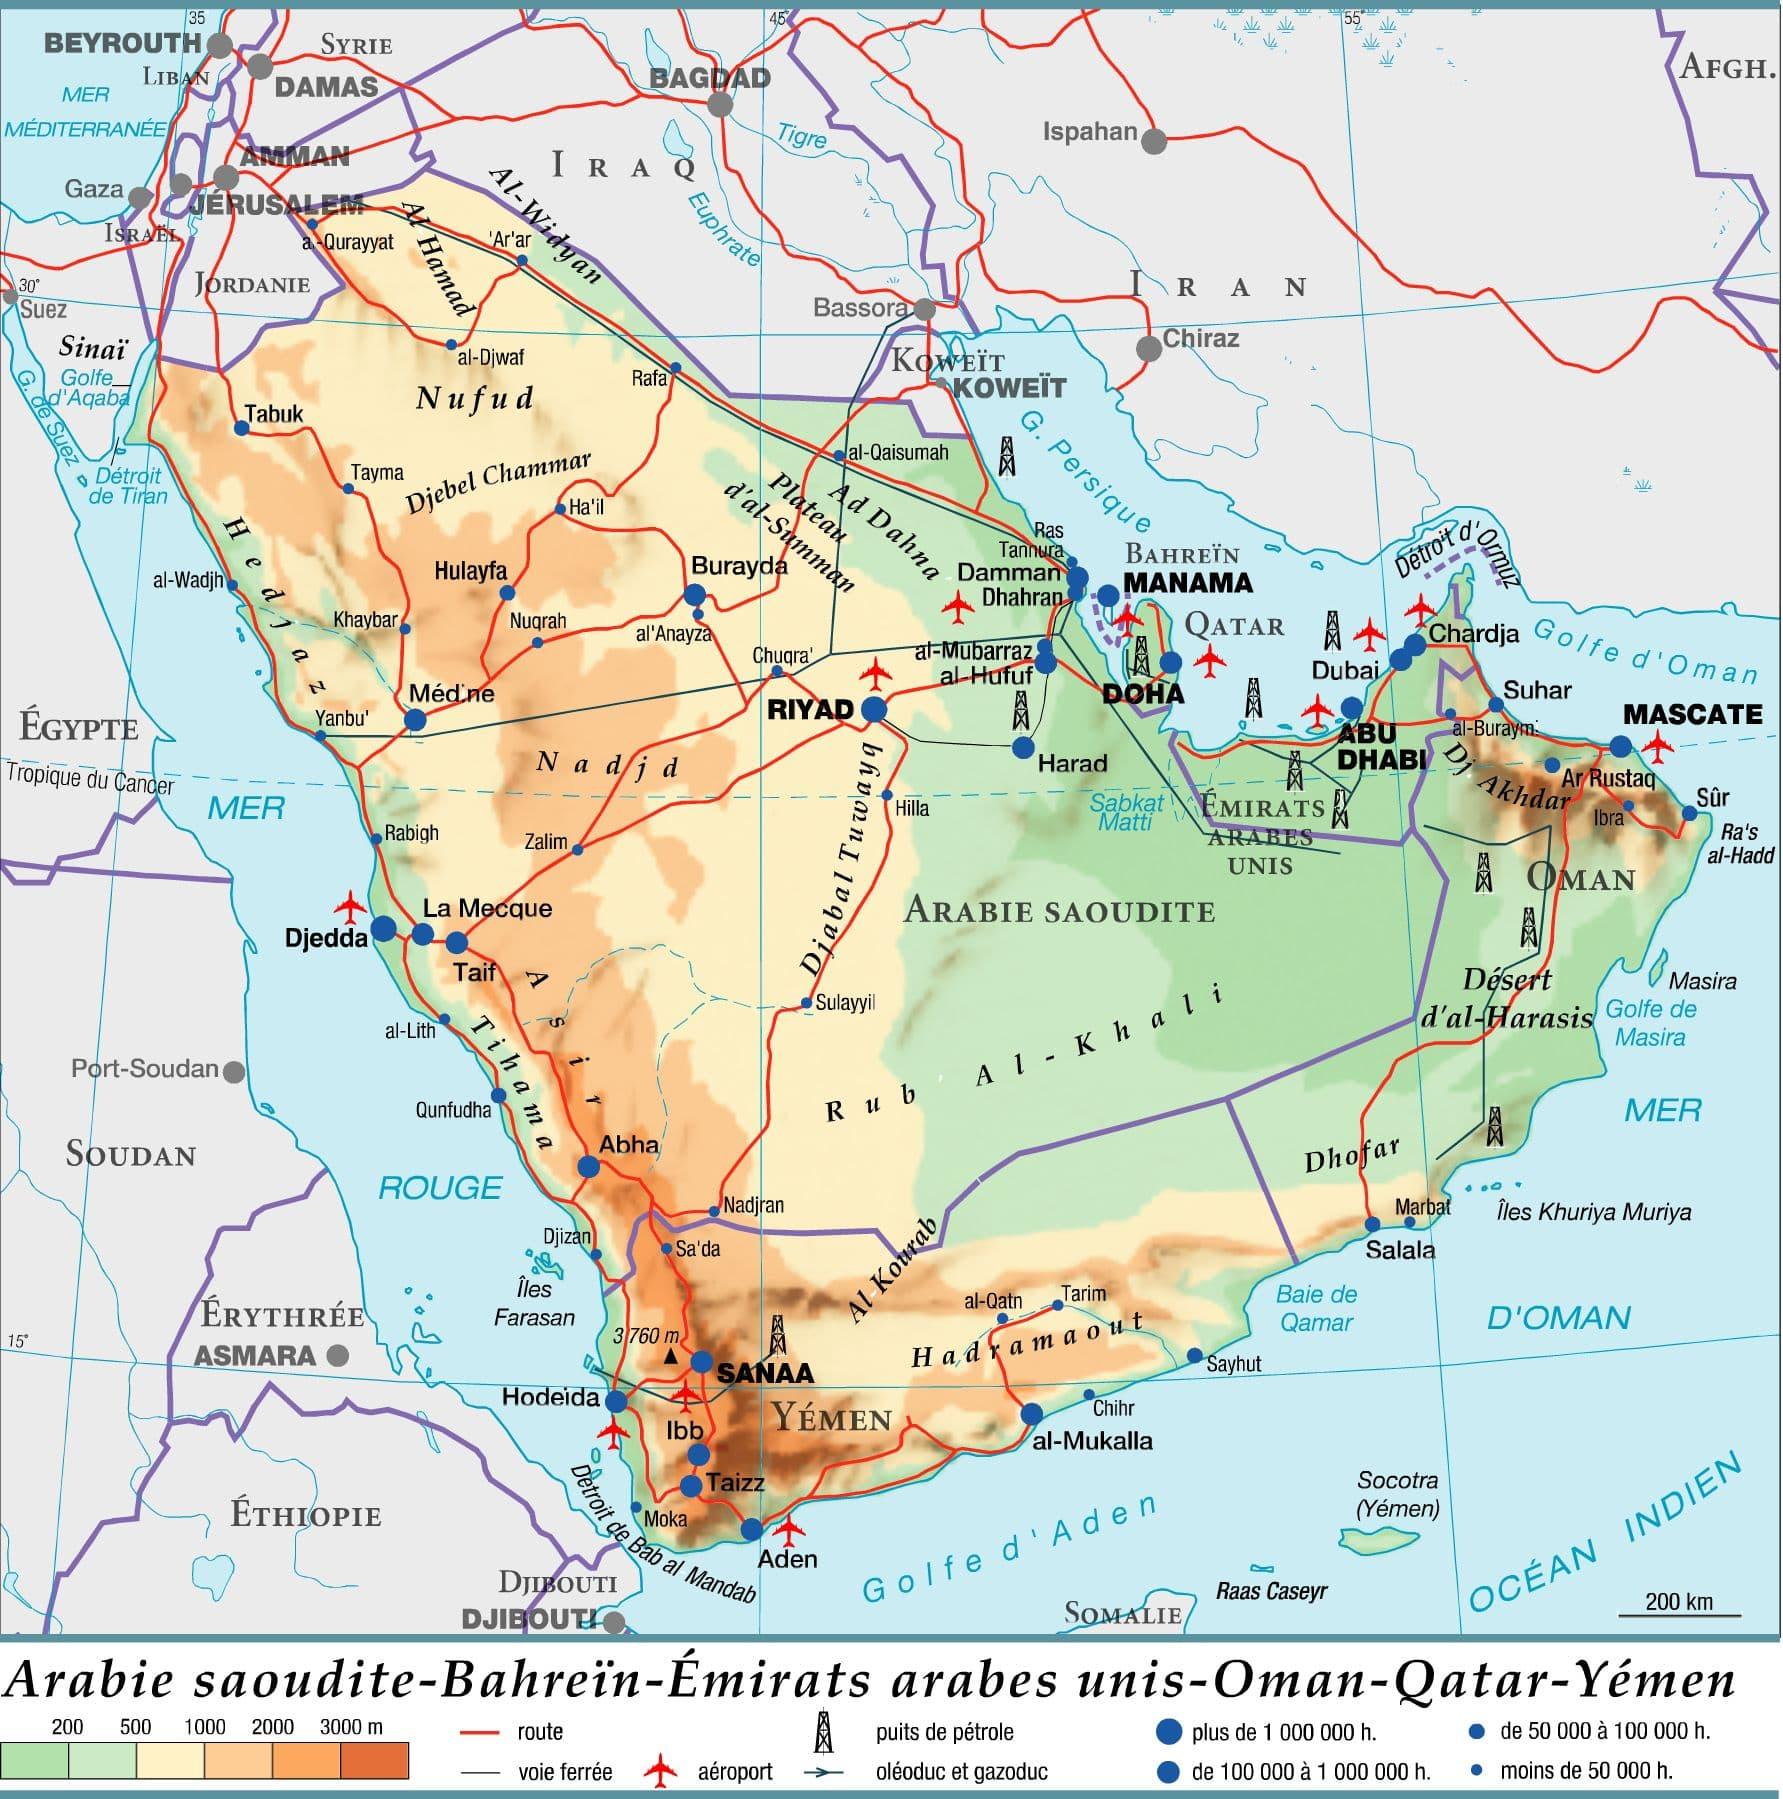 1306013-Arabie_saoudite_-_Bahreïn_-_Émirats_arabes_unis_-_Oman_-_Qatar_-_Yémen.HD